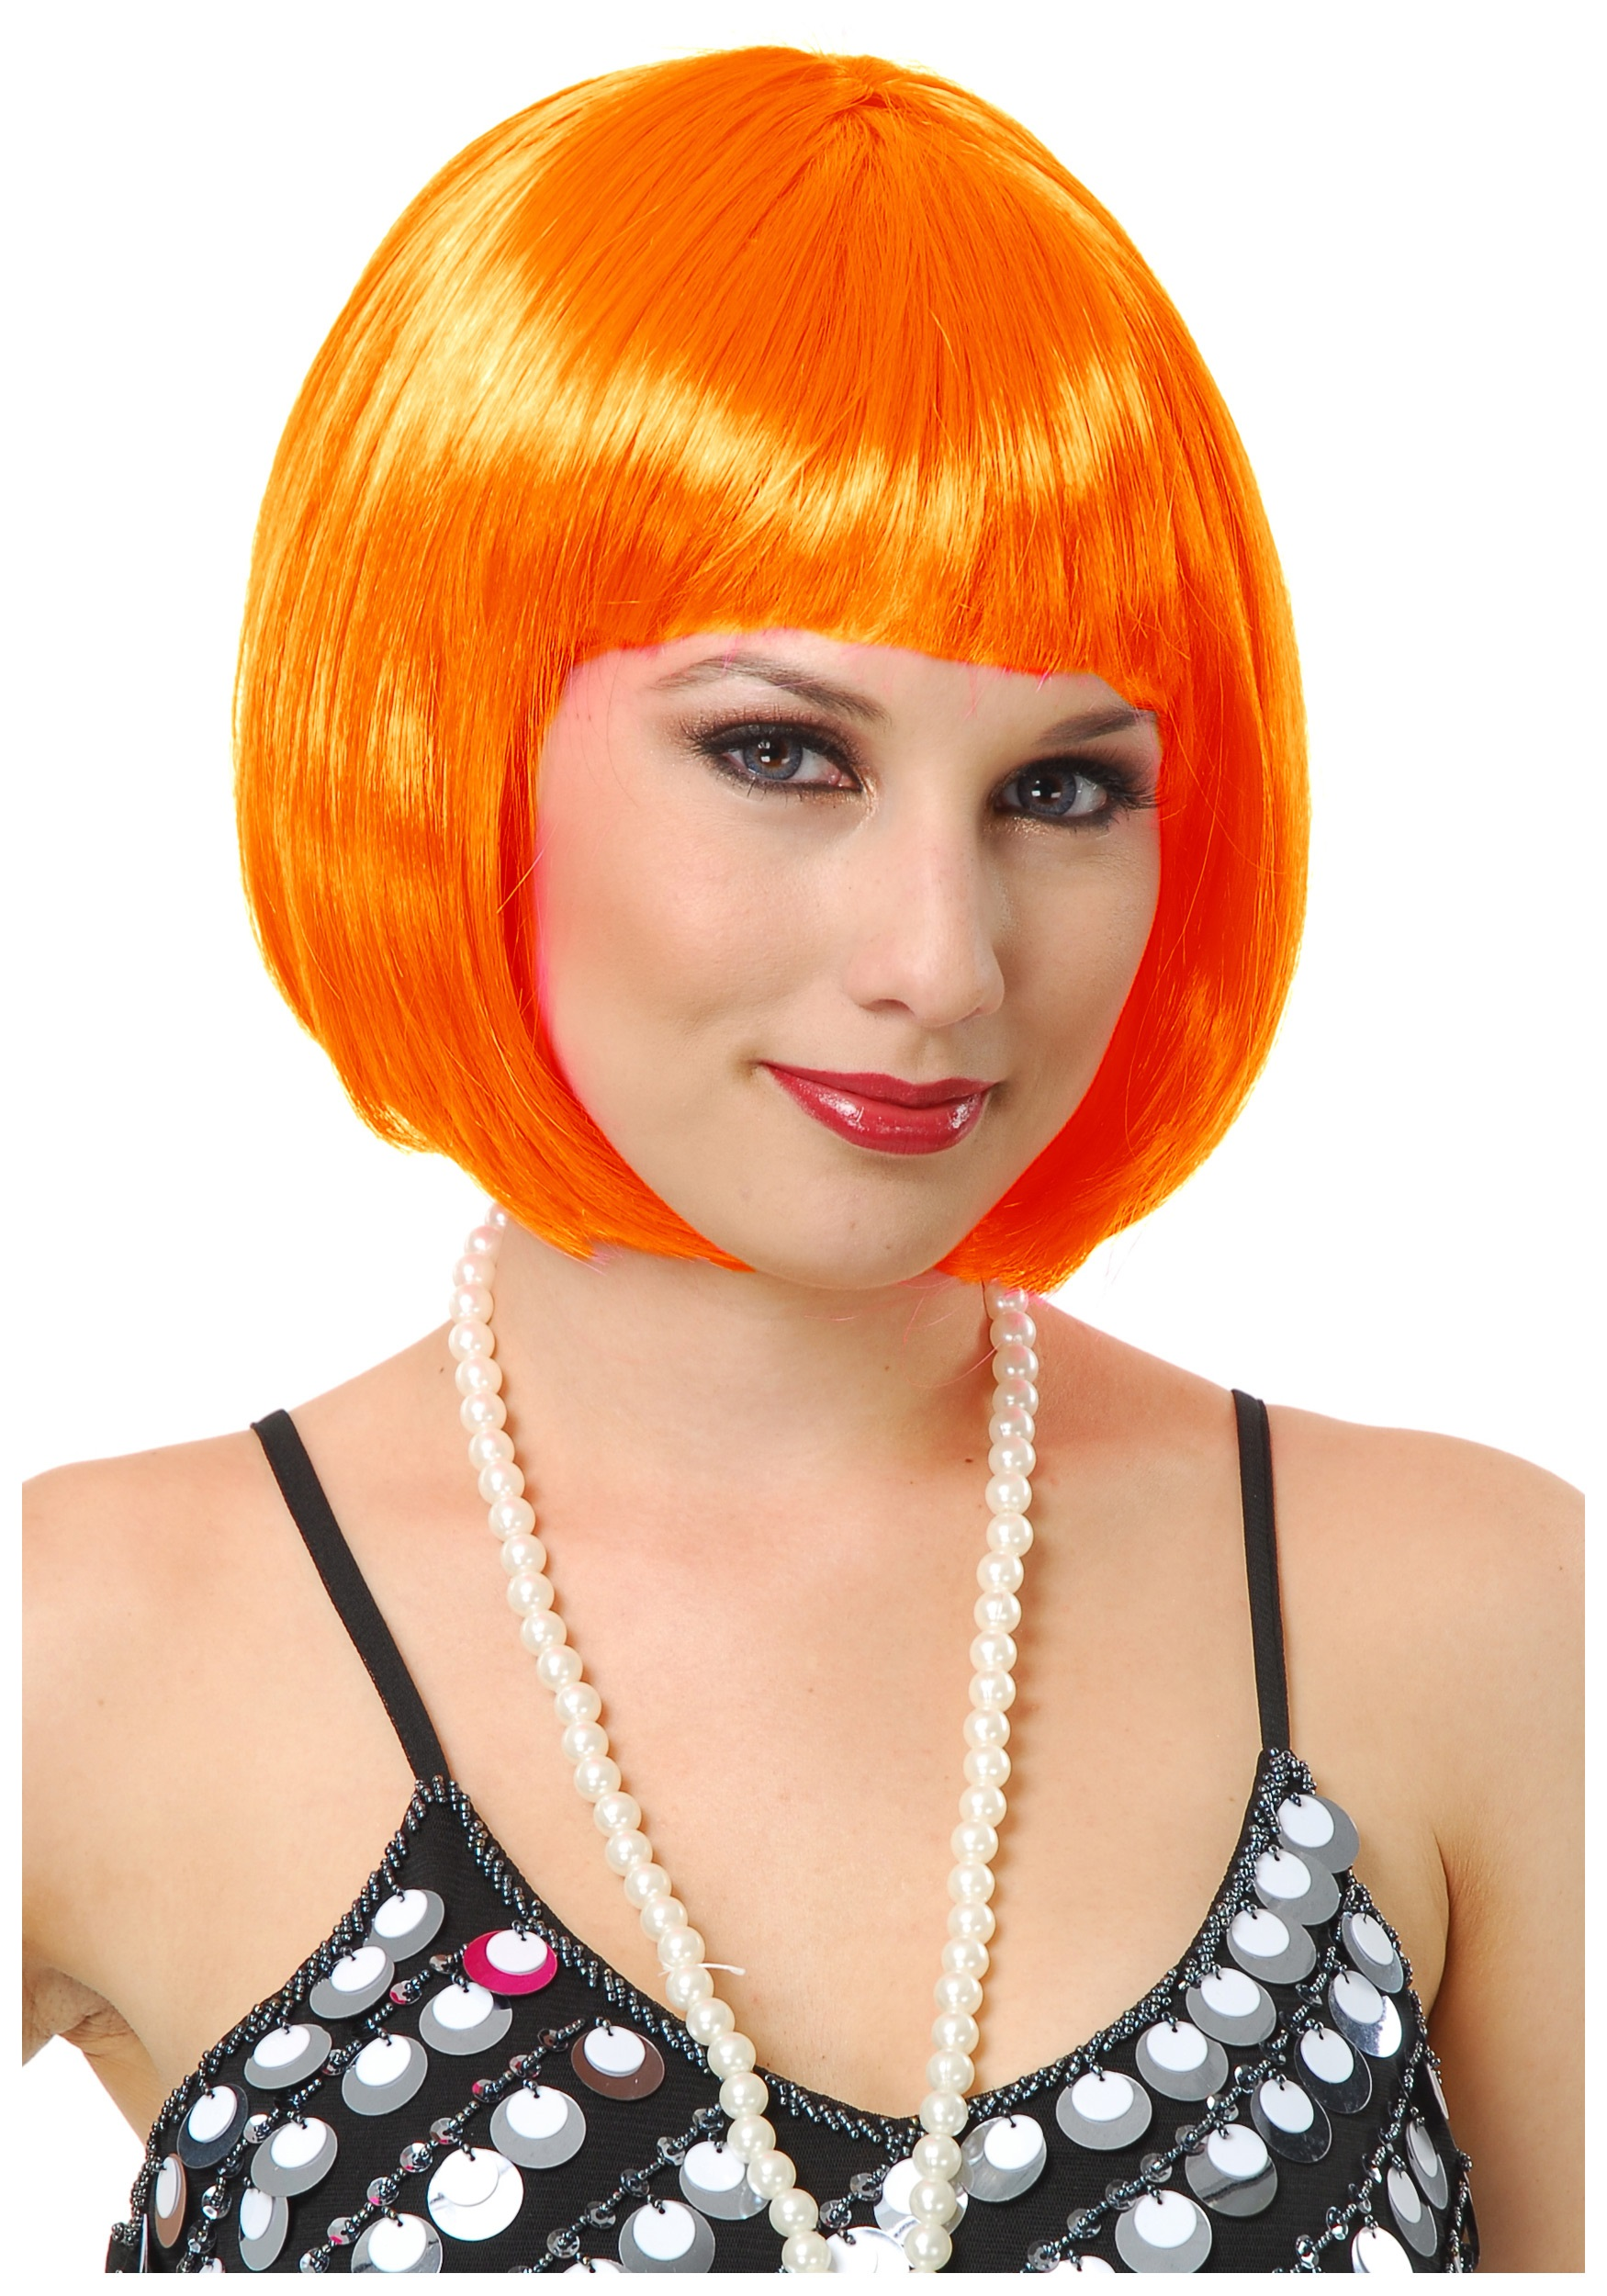 Fifth Element Costumes - Leeloo Costumes   HalloweenCostumes com